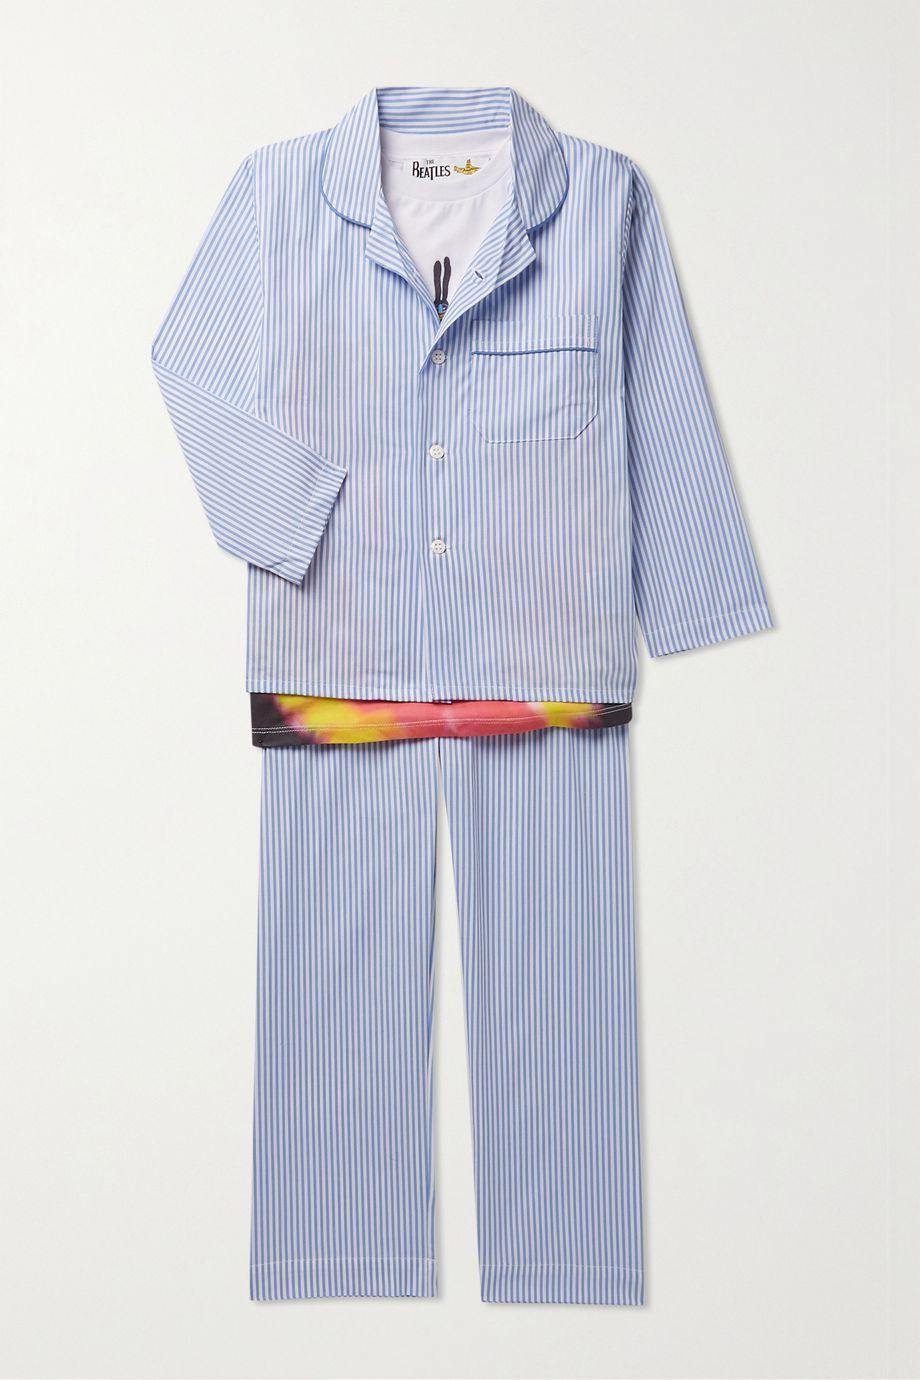 Derek Rose Kids 【3 - 12 岁】滚边条纹纯棉睡衣套装